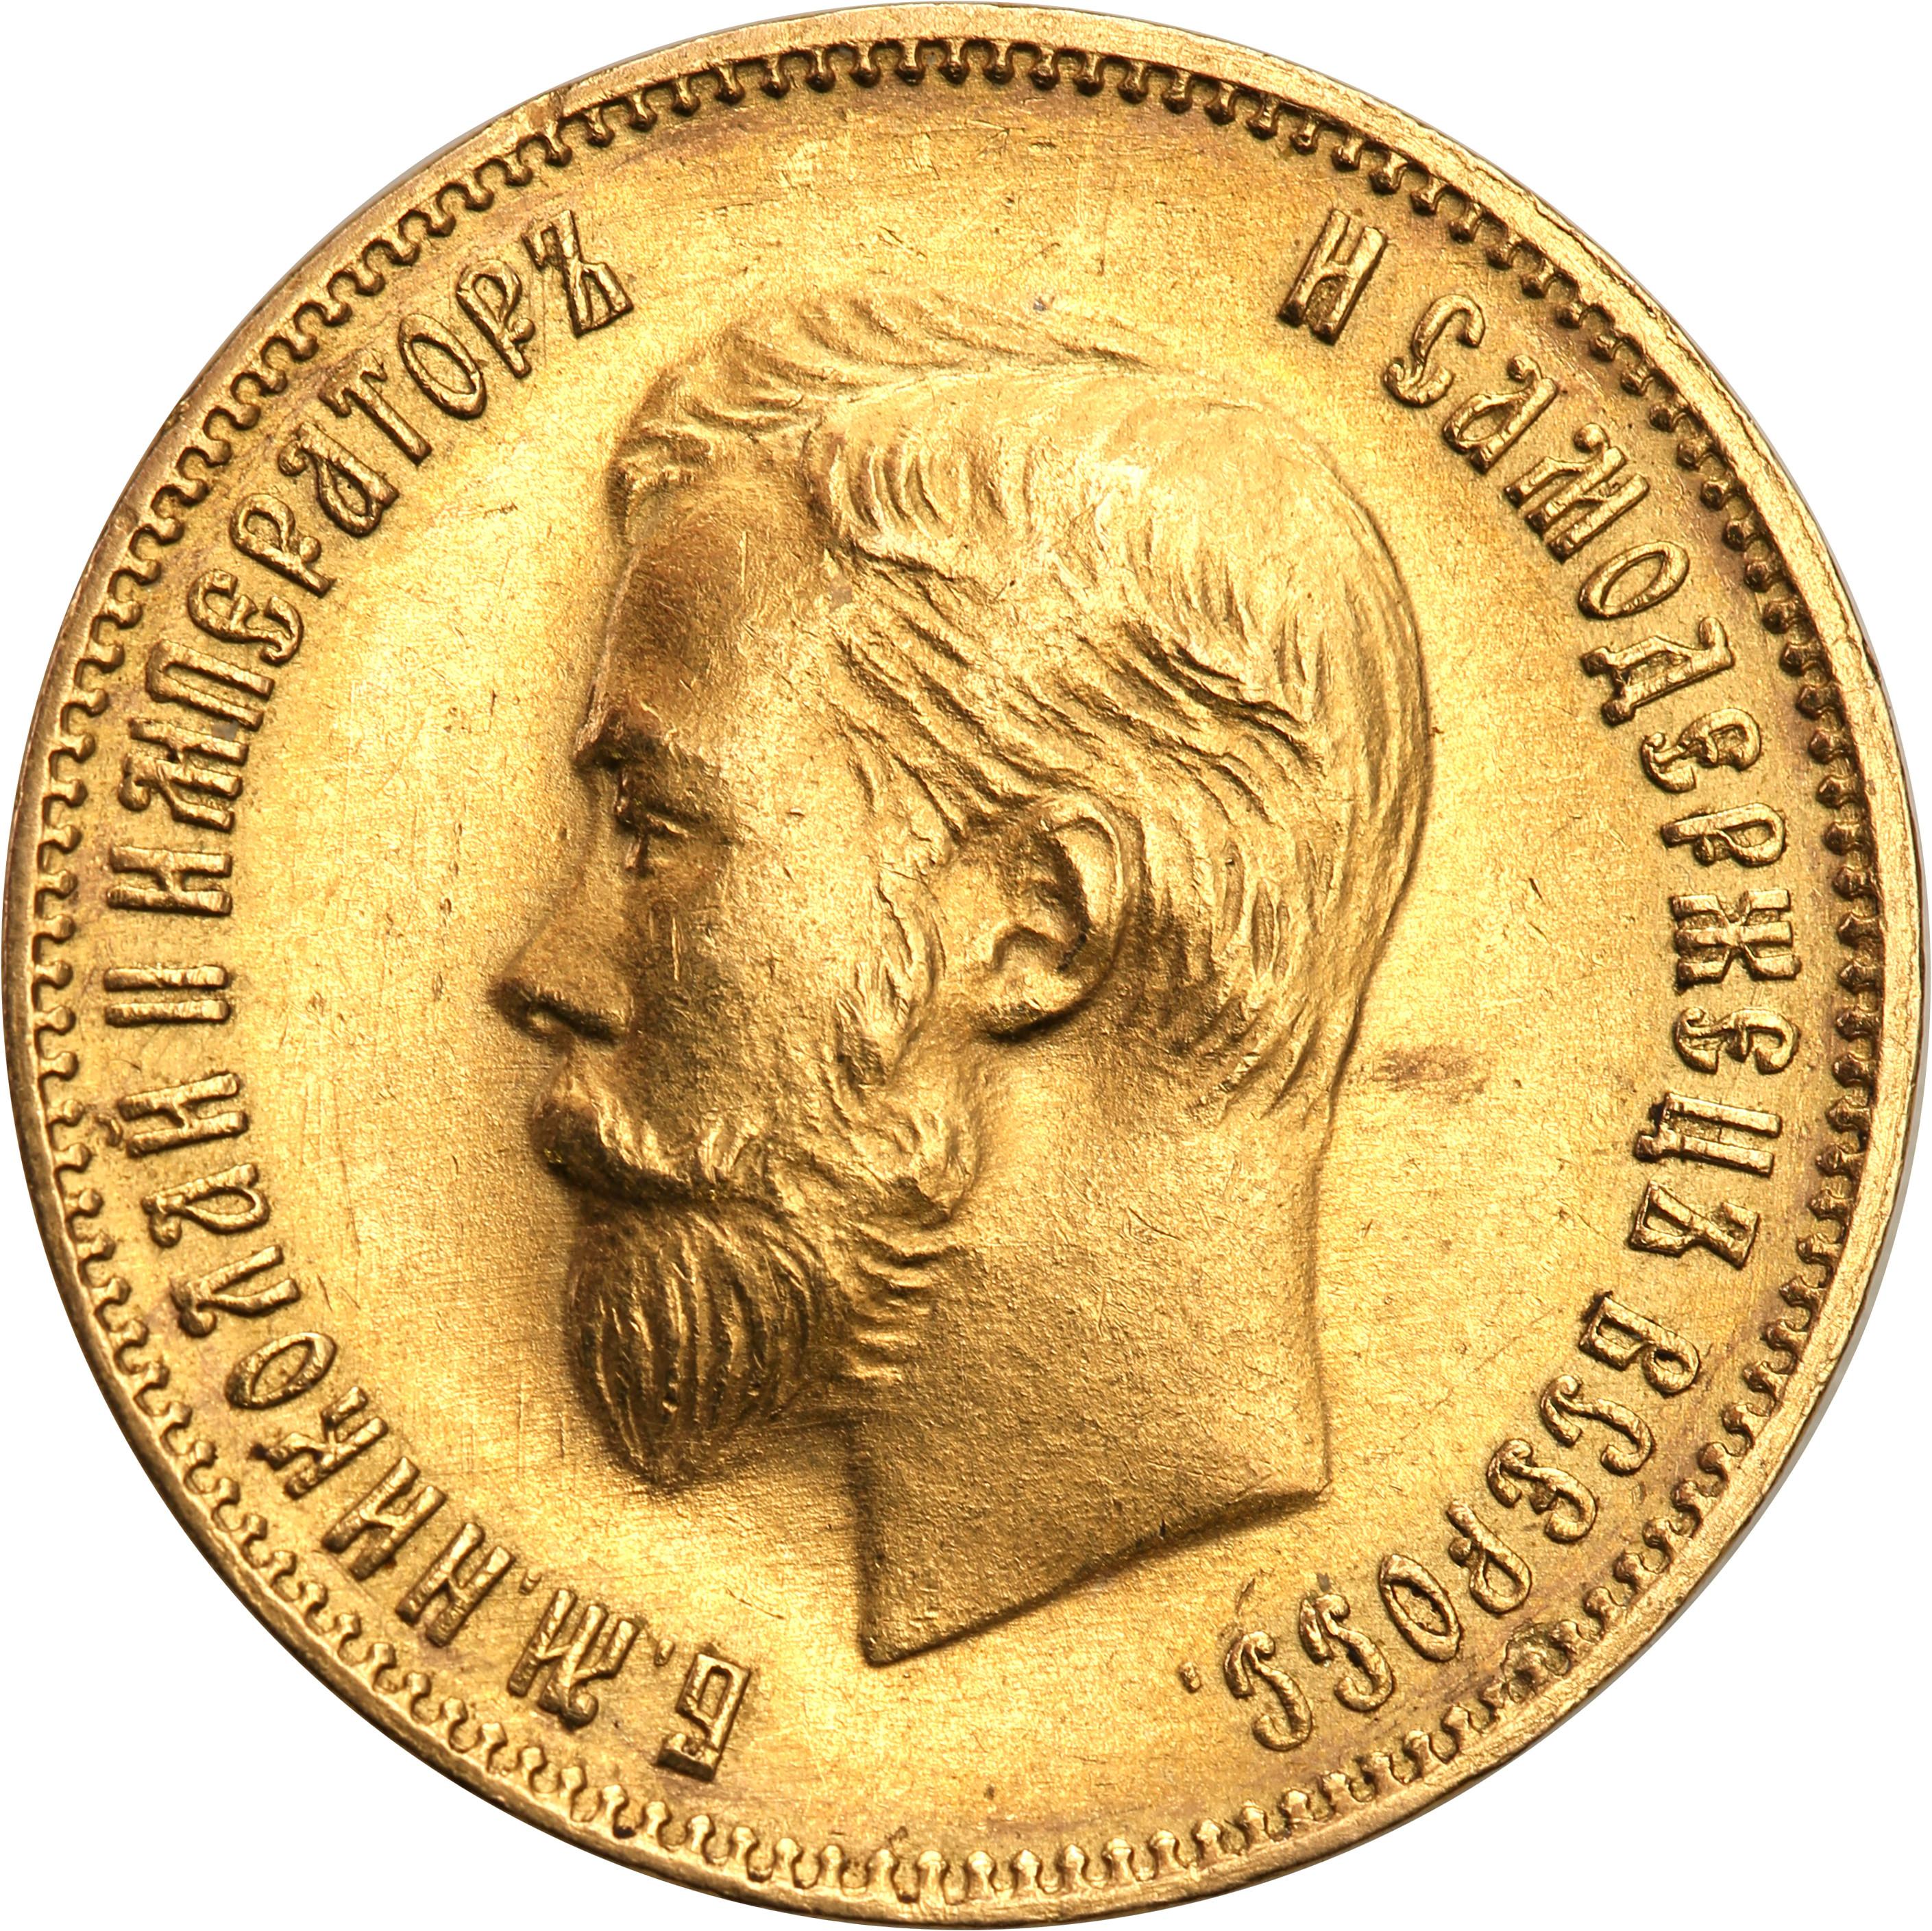 Rosja. Mikołaj II. 10 rubli 1903 АР, Petersburg - PIĘKNE st.1/1-